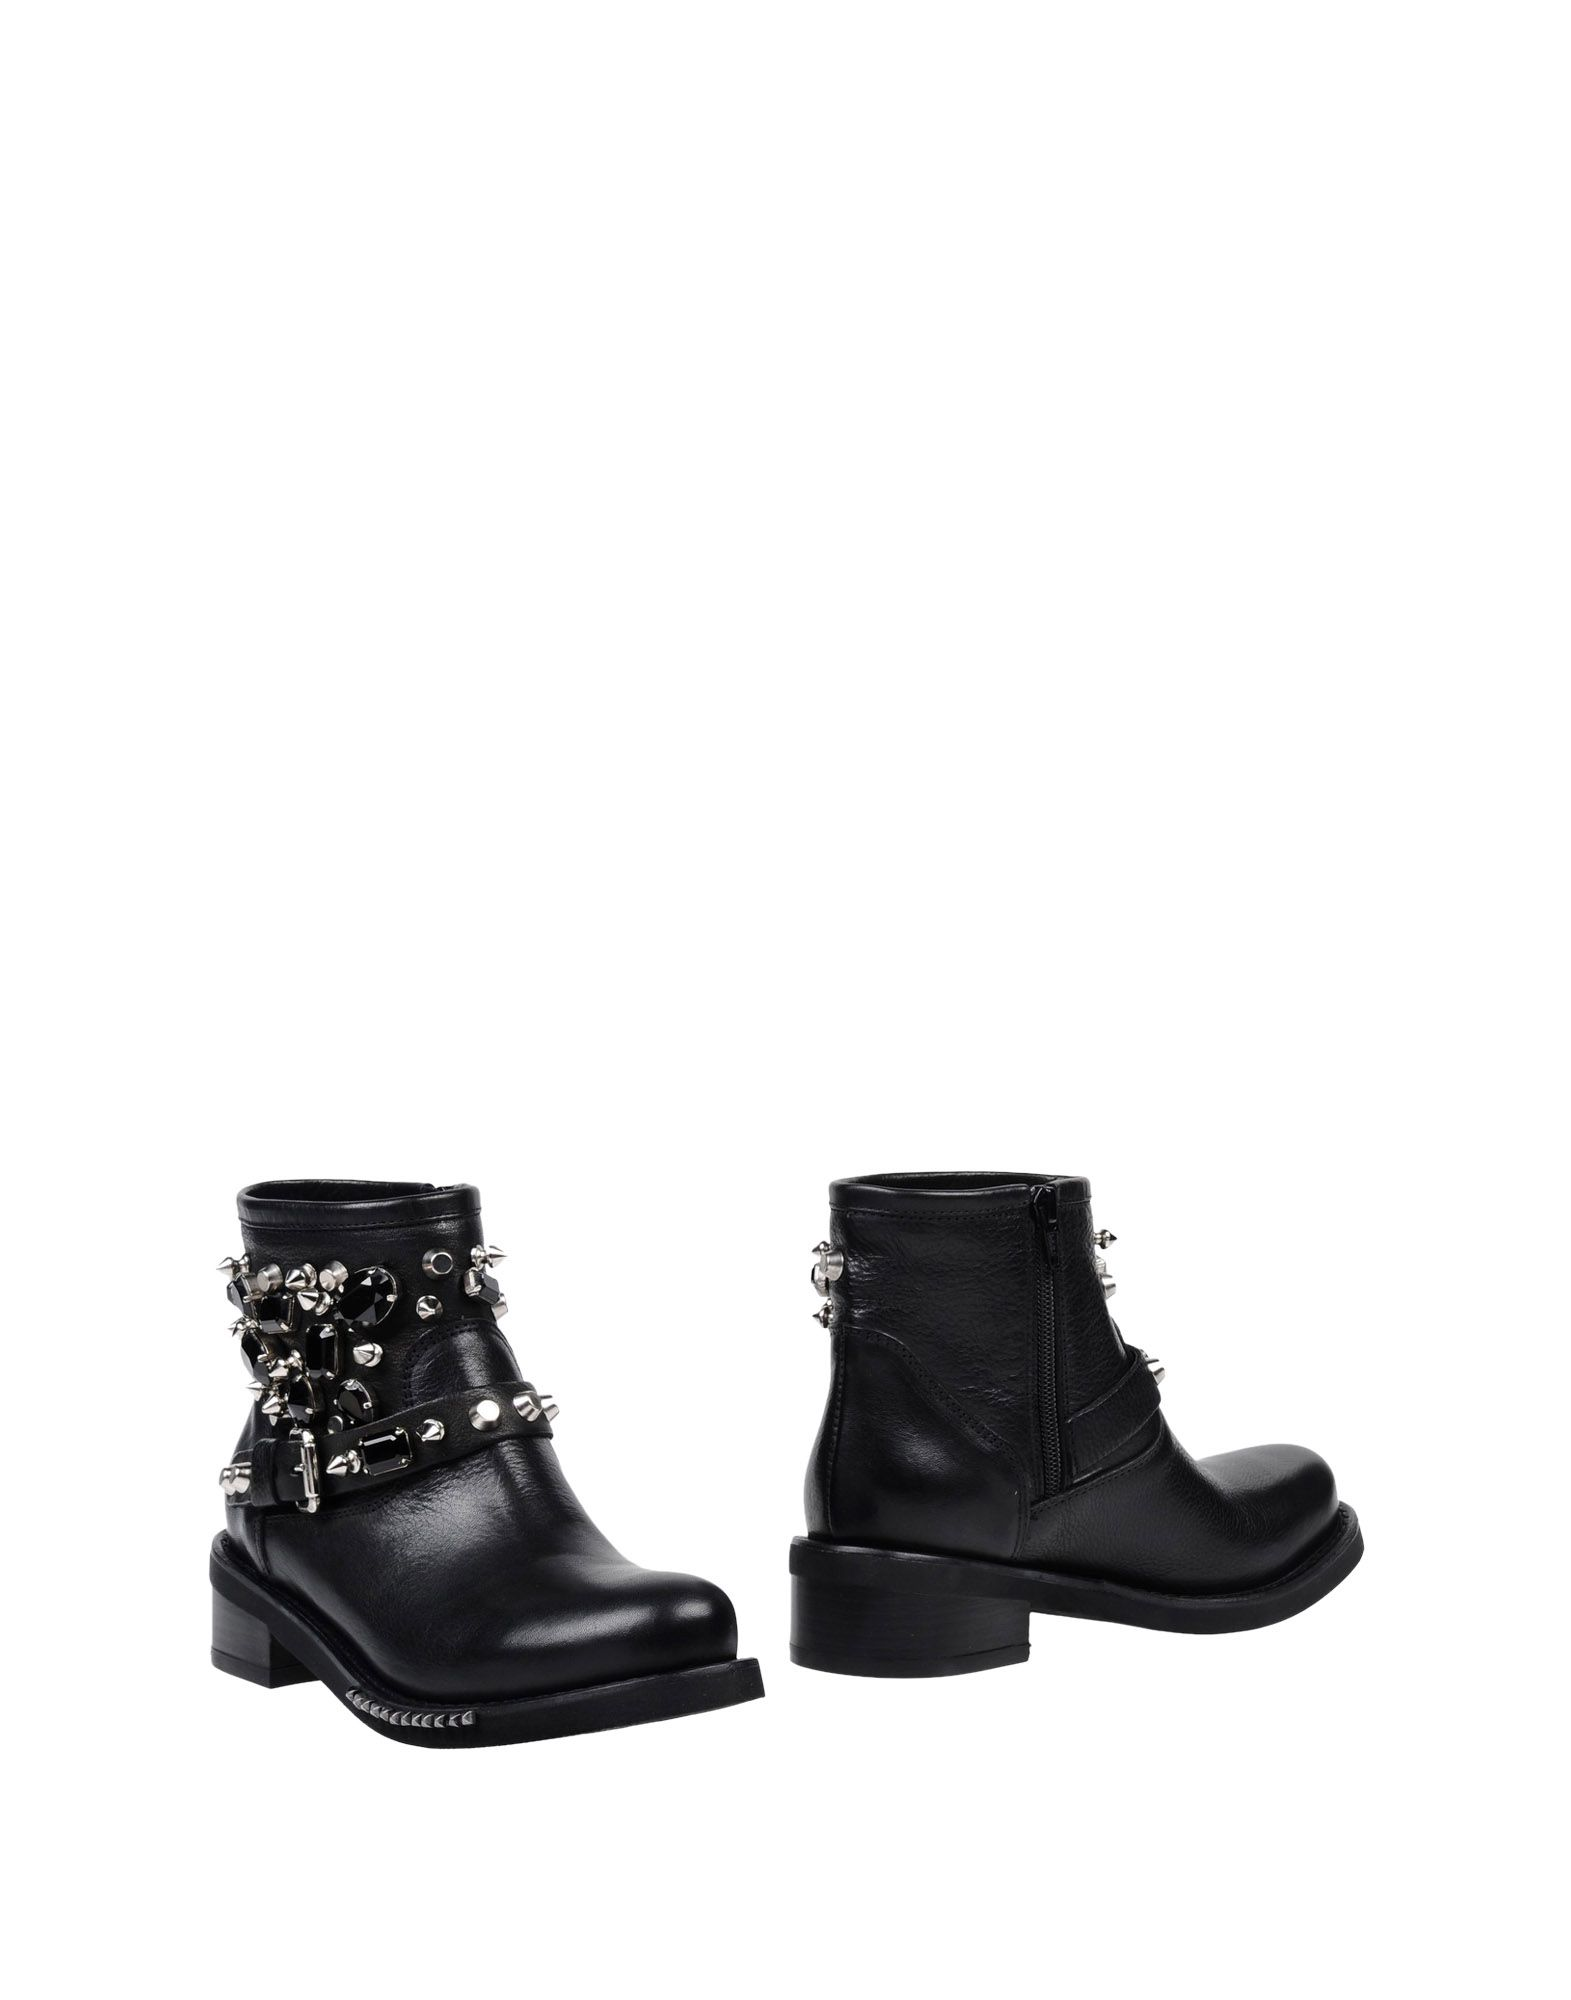 Bottine Charme Femme - Bottines Charme Noir Chaussures femme pas cher homme et femme